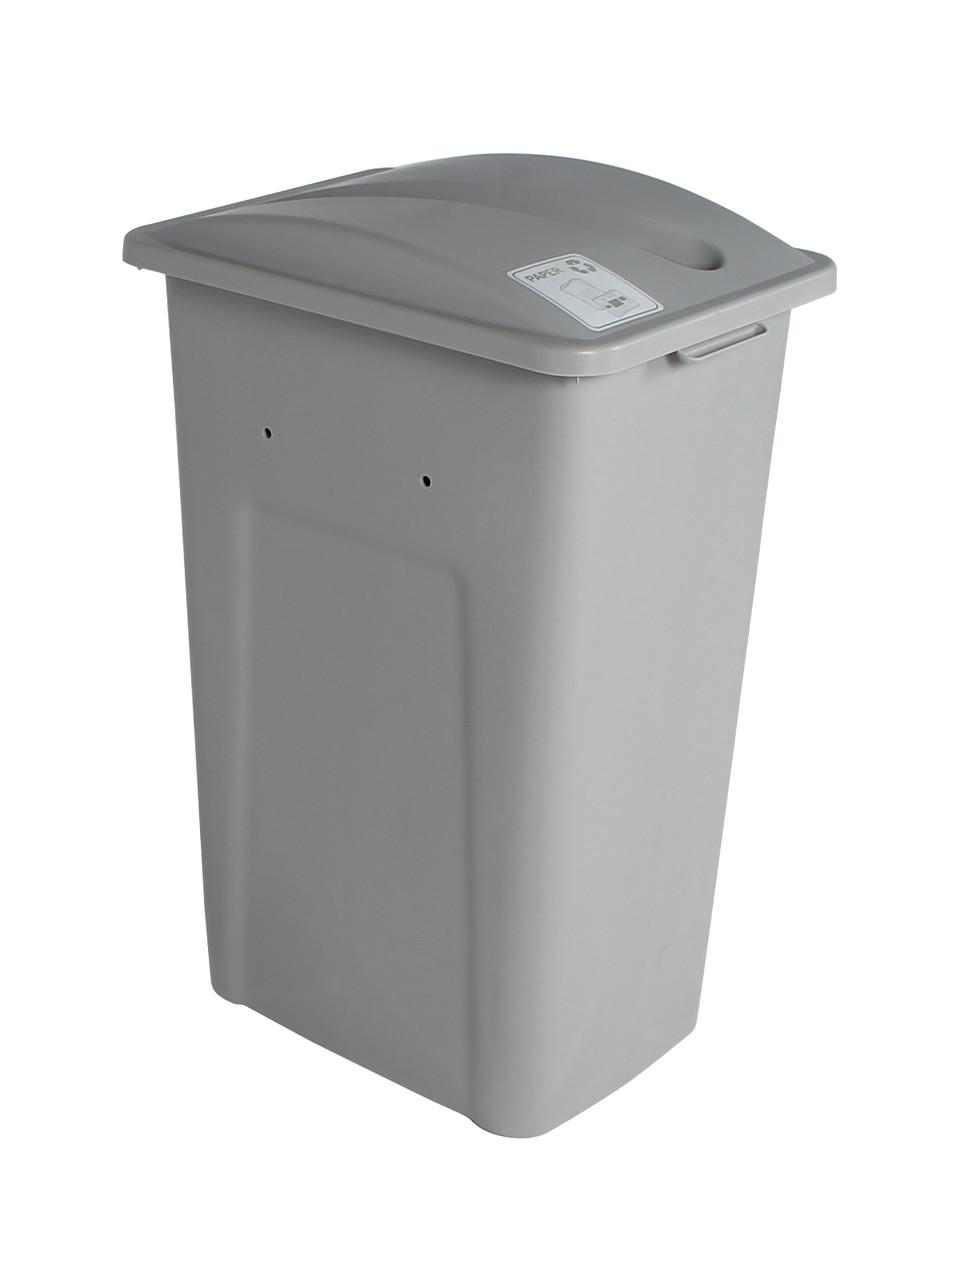 32 Gallon XL Simple Sort Recycling Bin (Paper, Gray Lid)